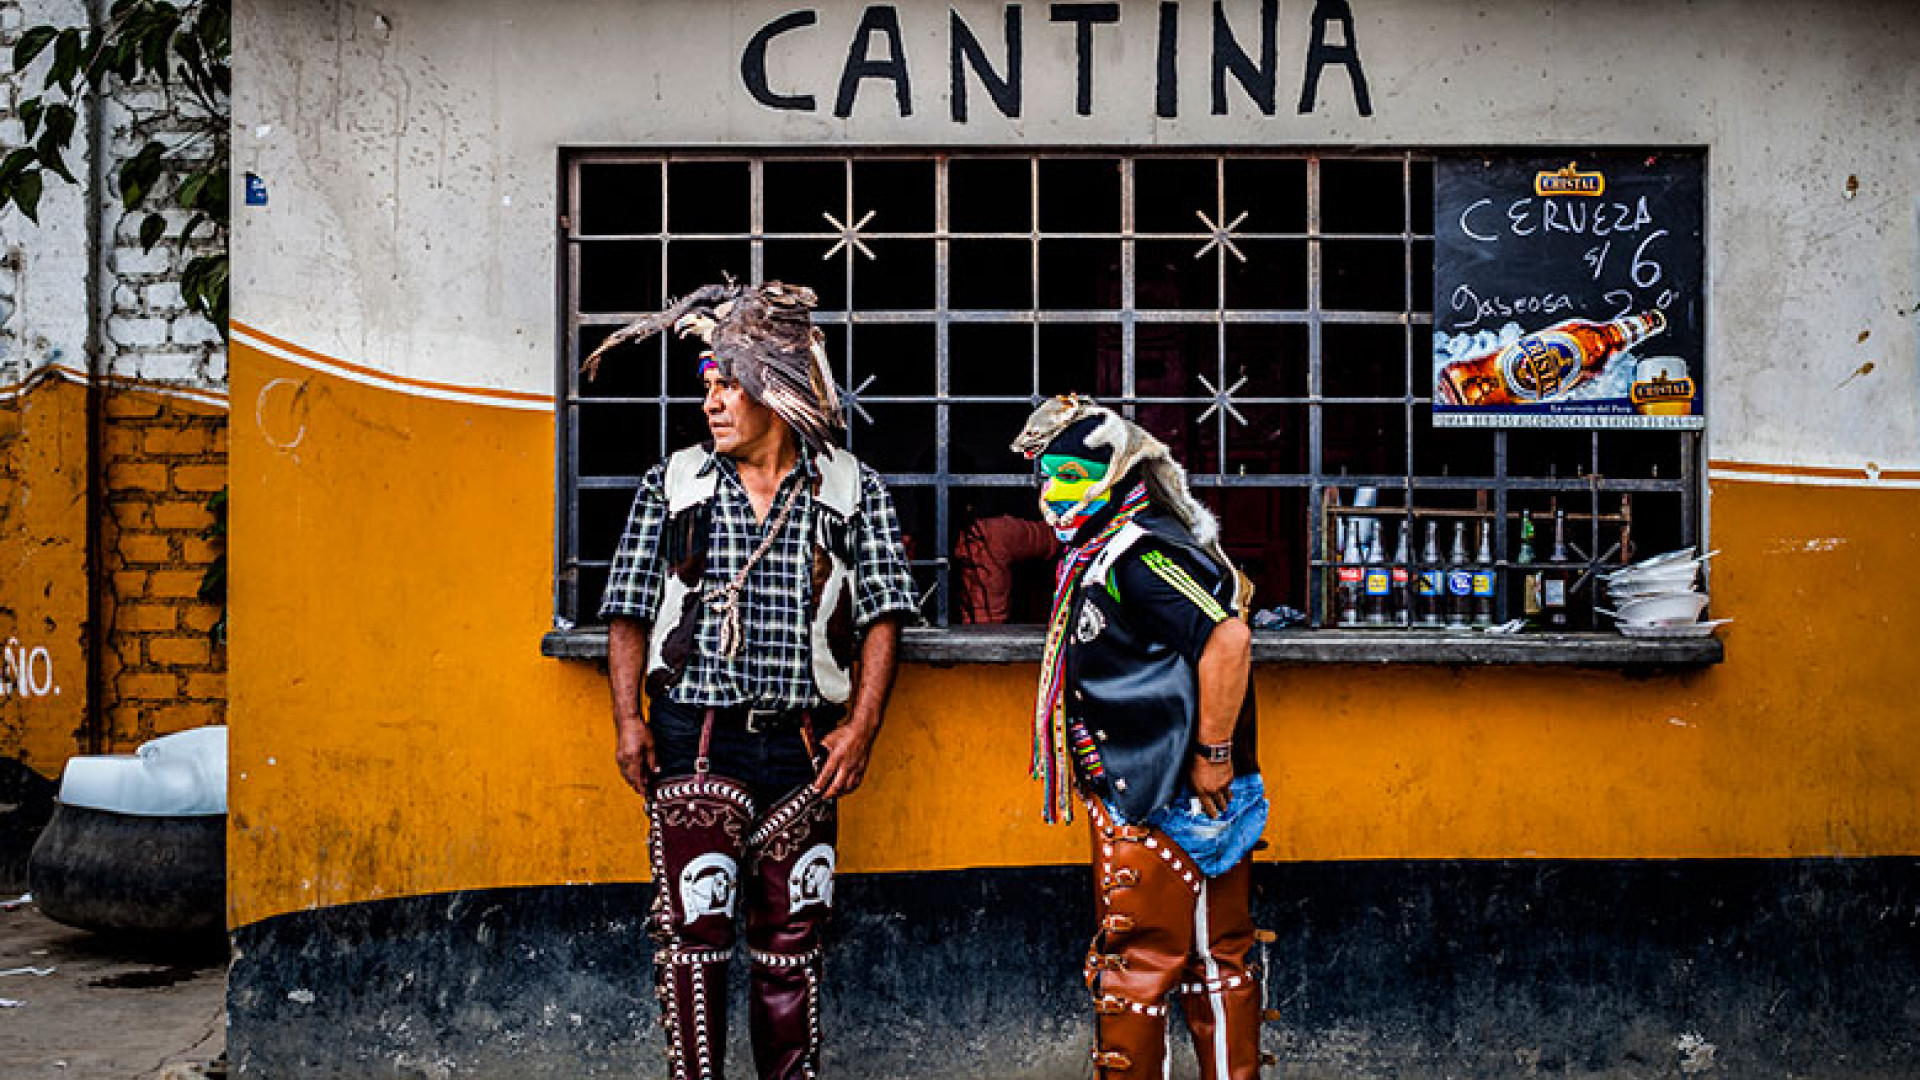 130674698391670698_David-Martin-Huamani-Bedoya_Peru_Shortlist_Open_Arts-and-Culture_2015